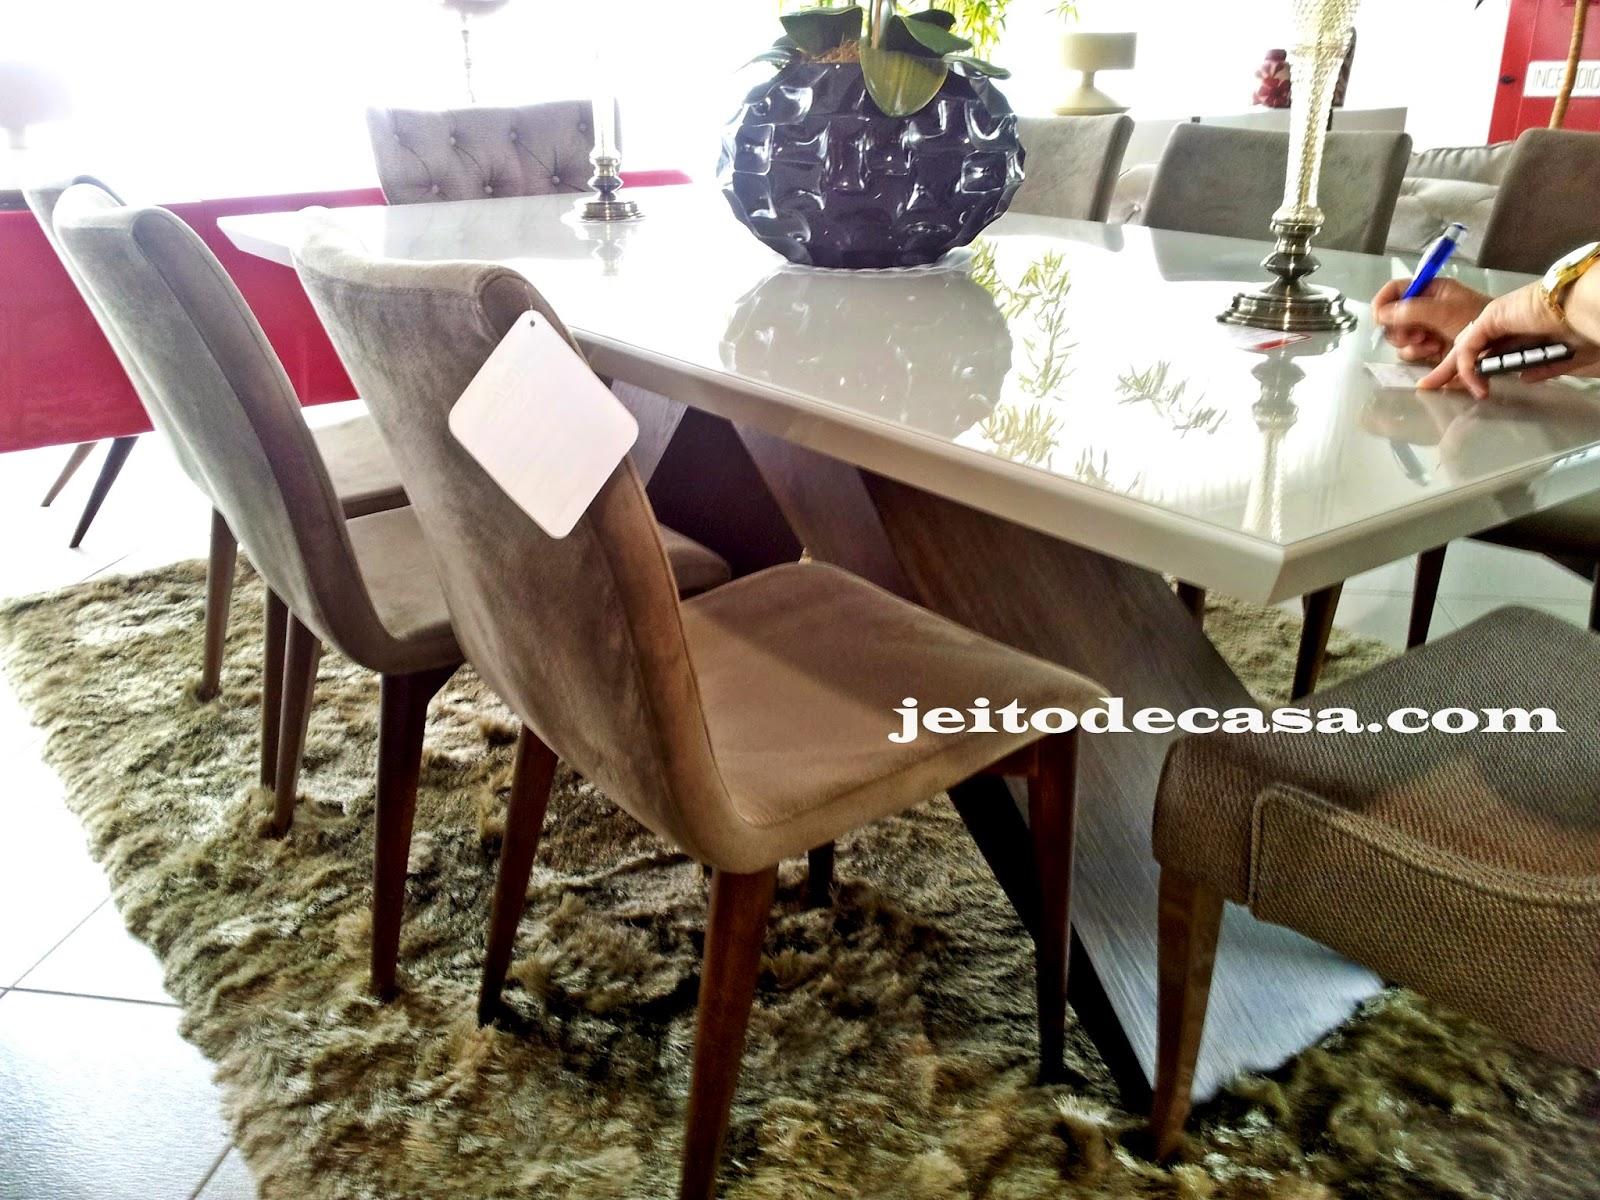 Mesas de jantar modelos que vi por aqui! Jeito de Casa Blog de  #913A52 1600x1200